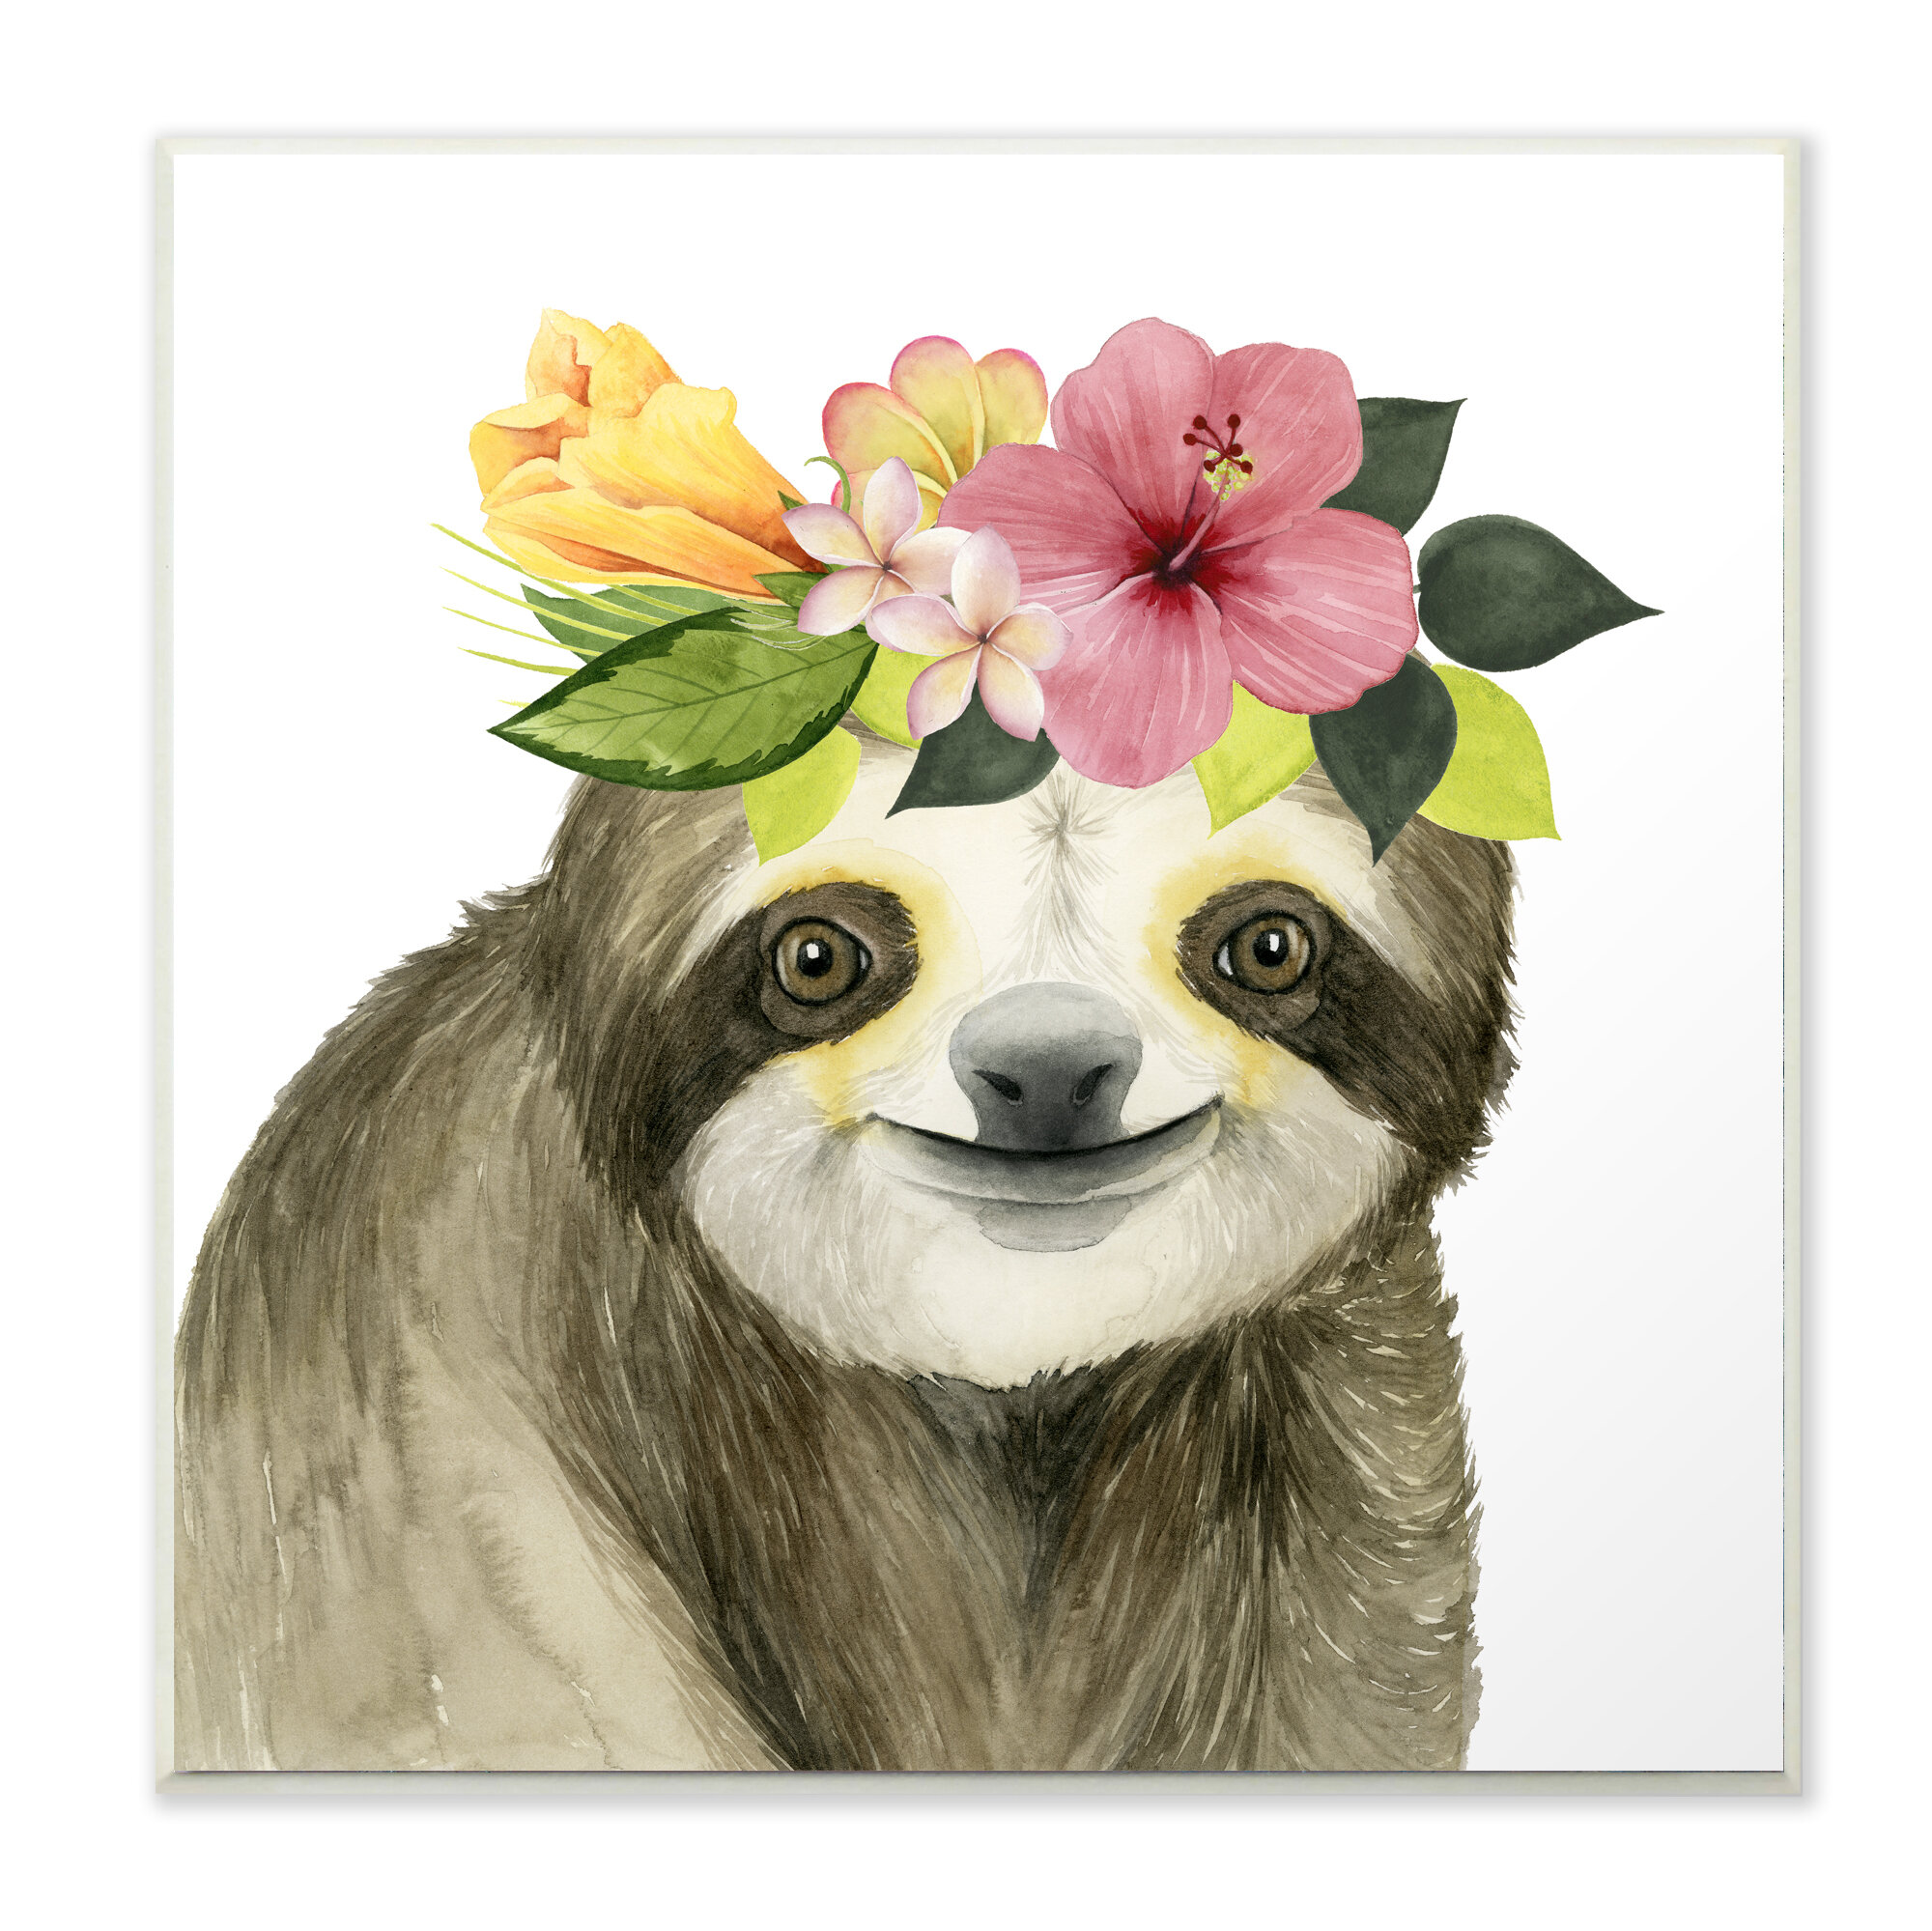 Harriet Bee Coachella Ready Sloth In Flower Crown Graphic Art